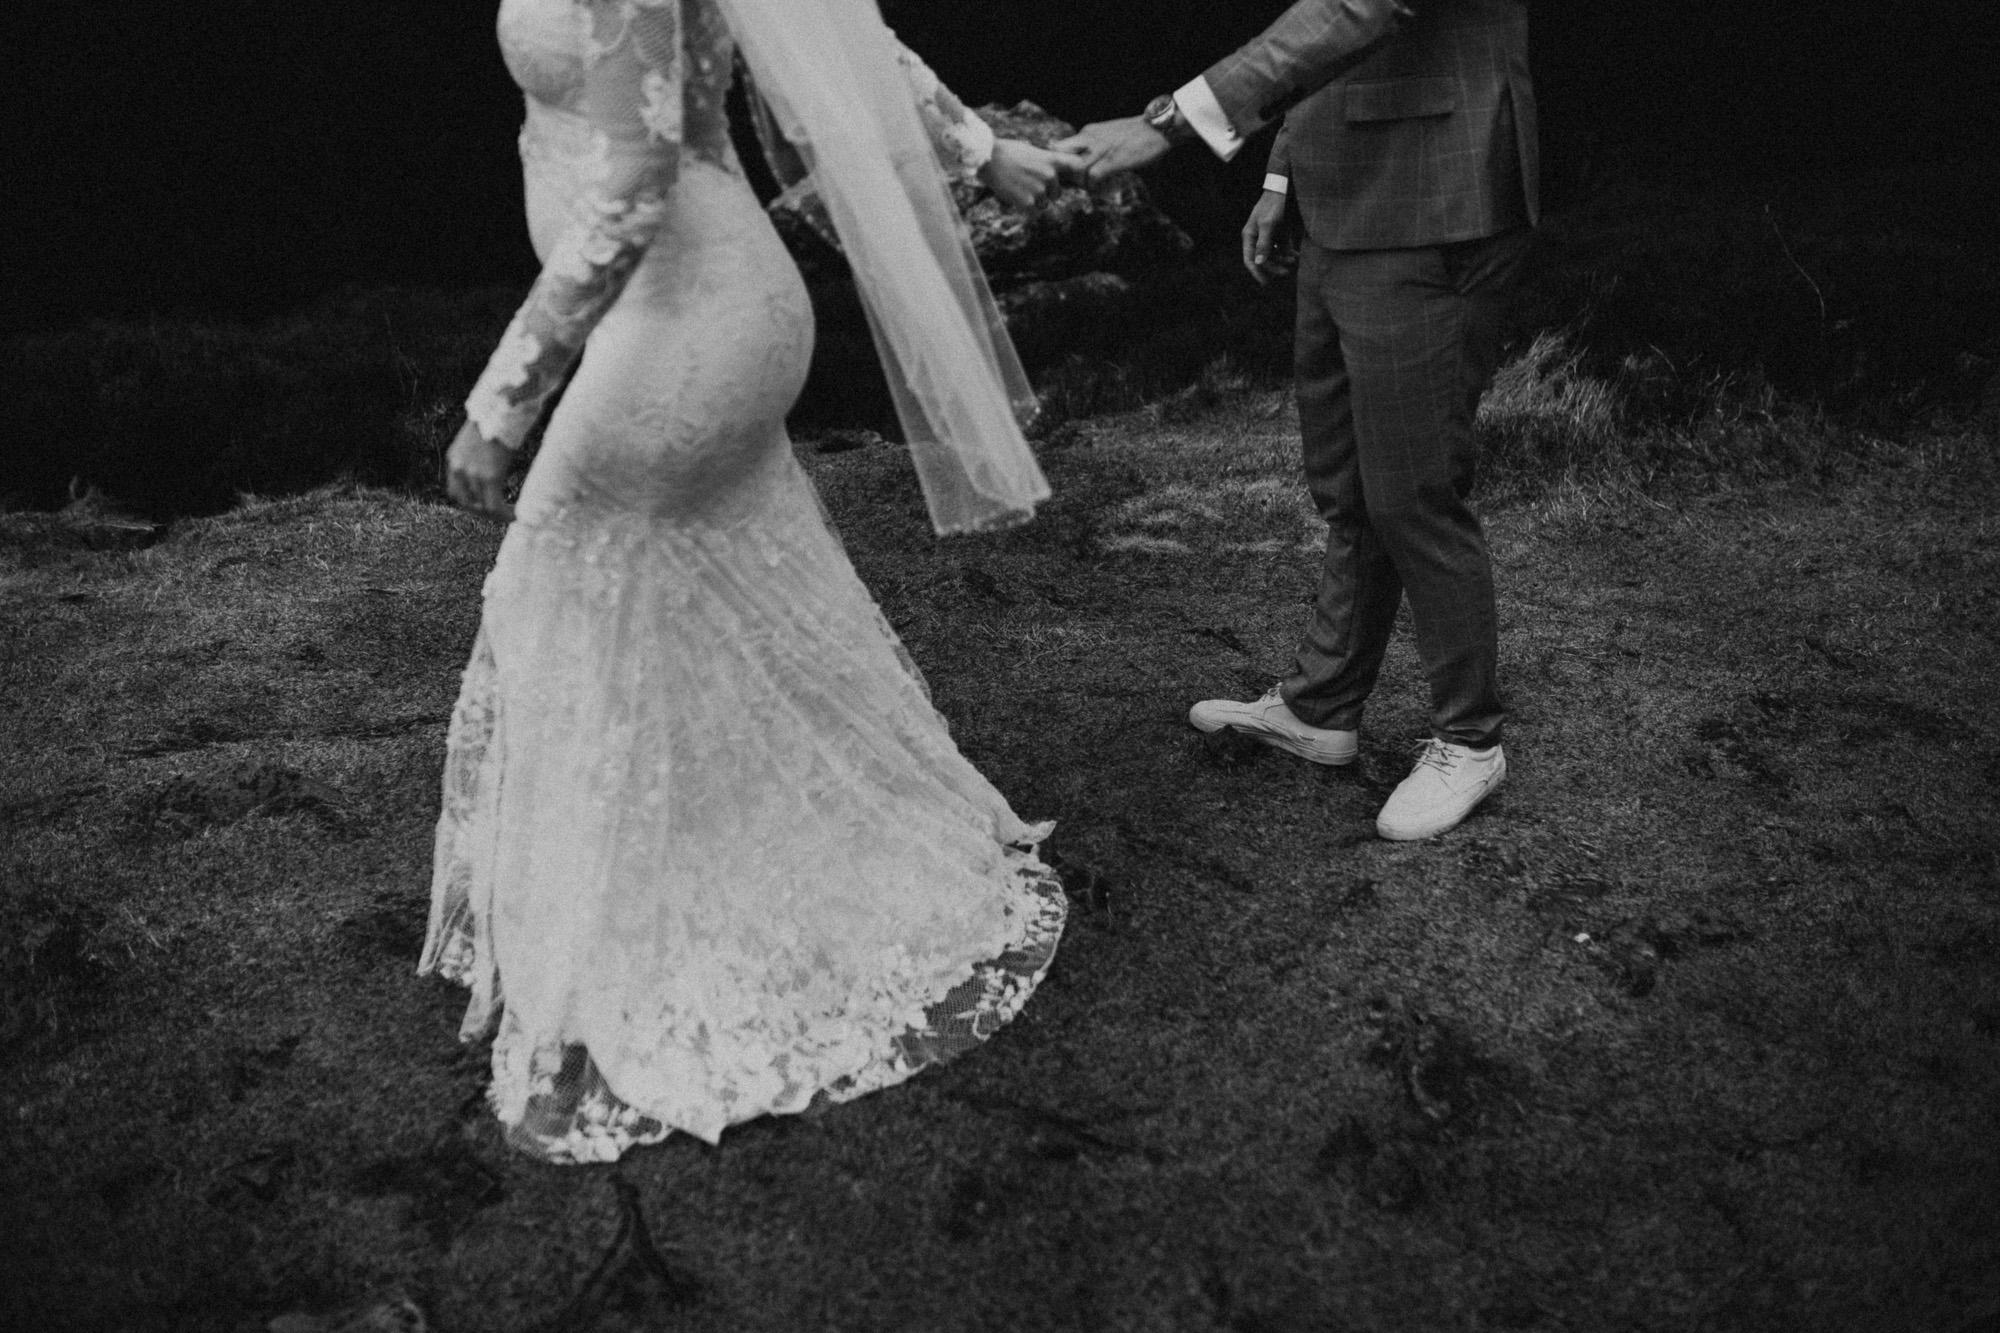 DanielaMarquardtPhotography_Hochzeitsfotograf_Düsseldorf_Köln_Mallorca_Bayern_Austria_Harz_LinaundMaik_Afterwedding-Shooting_Weddingphotographer_Ibiza_Tuskany_Italien_Toskana78